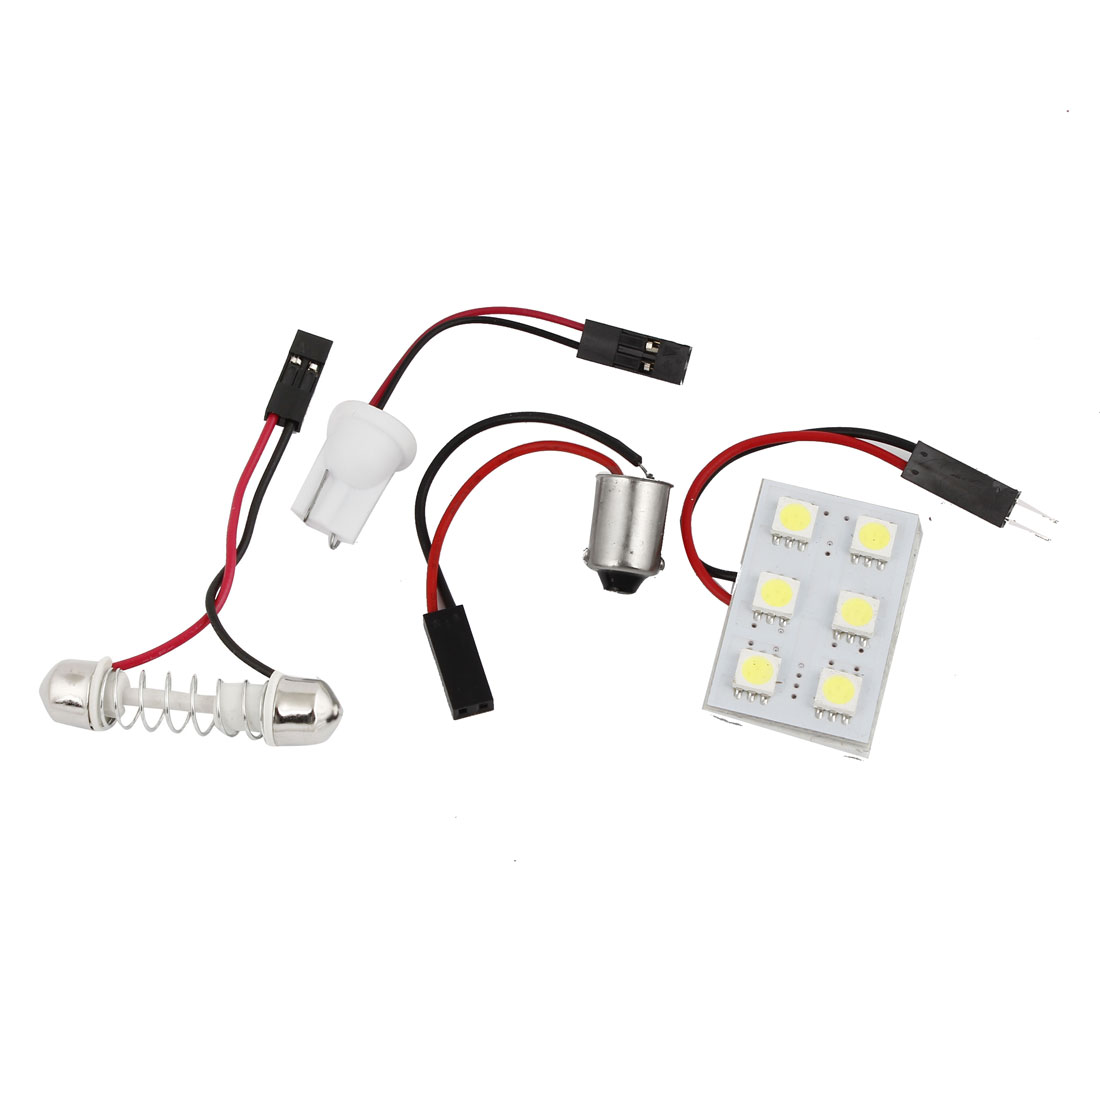 6 White 5050 SMD LED Car Auto Internal Map Roof Light w BA9S T10 Festoon Adapter